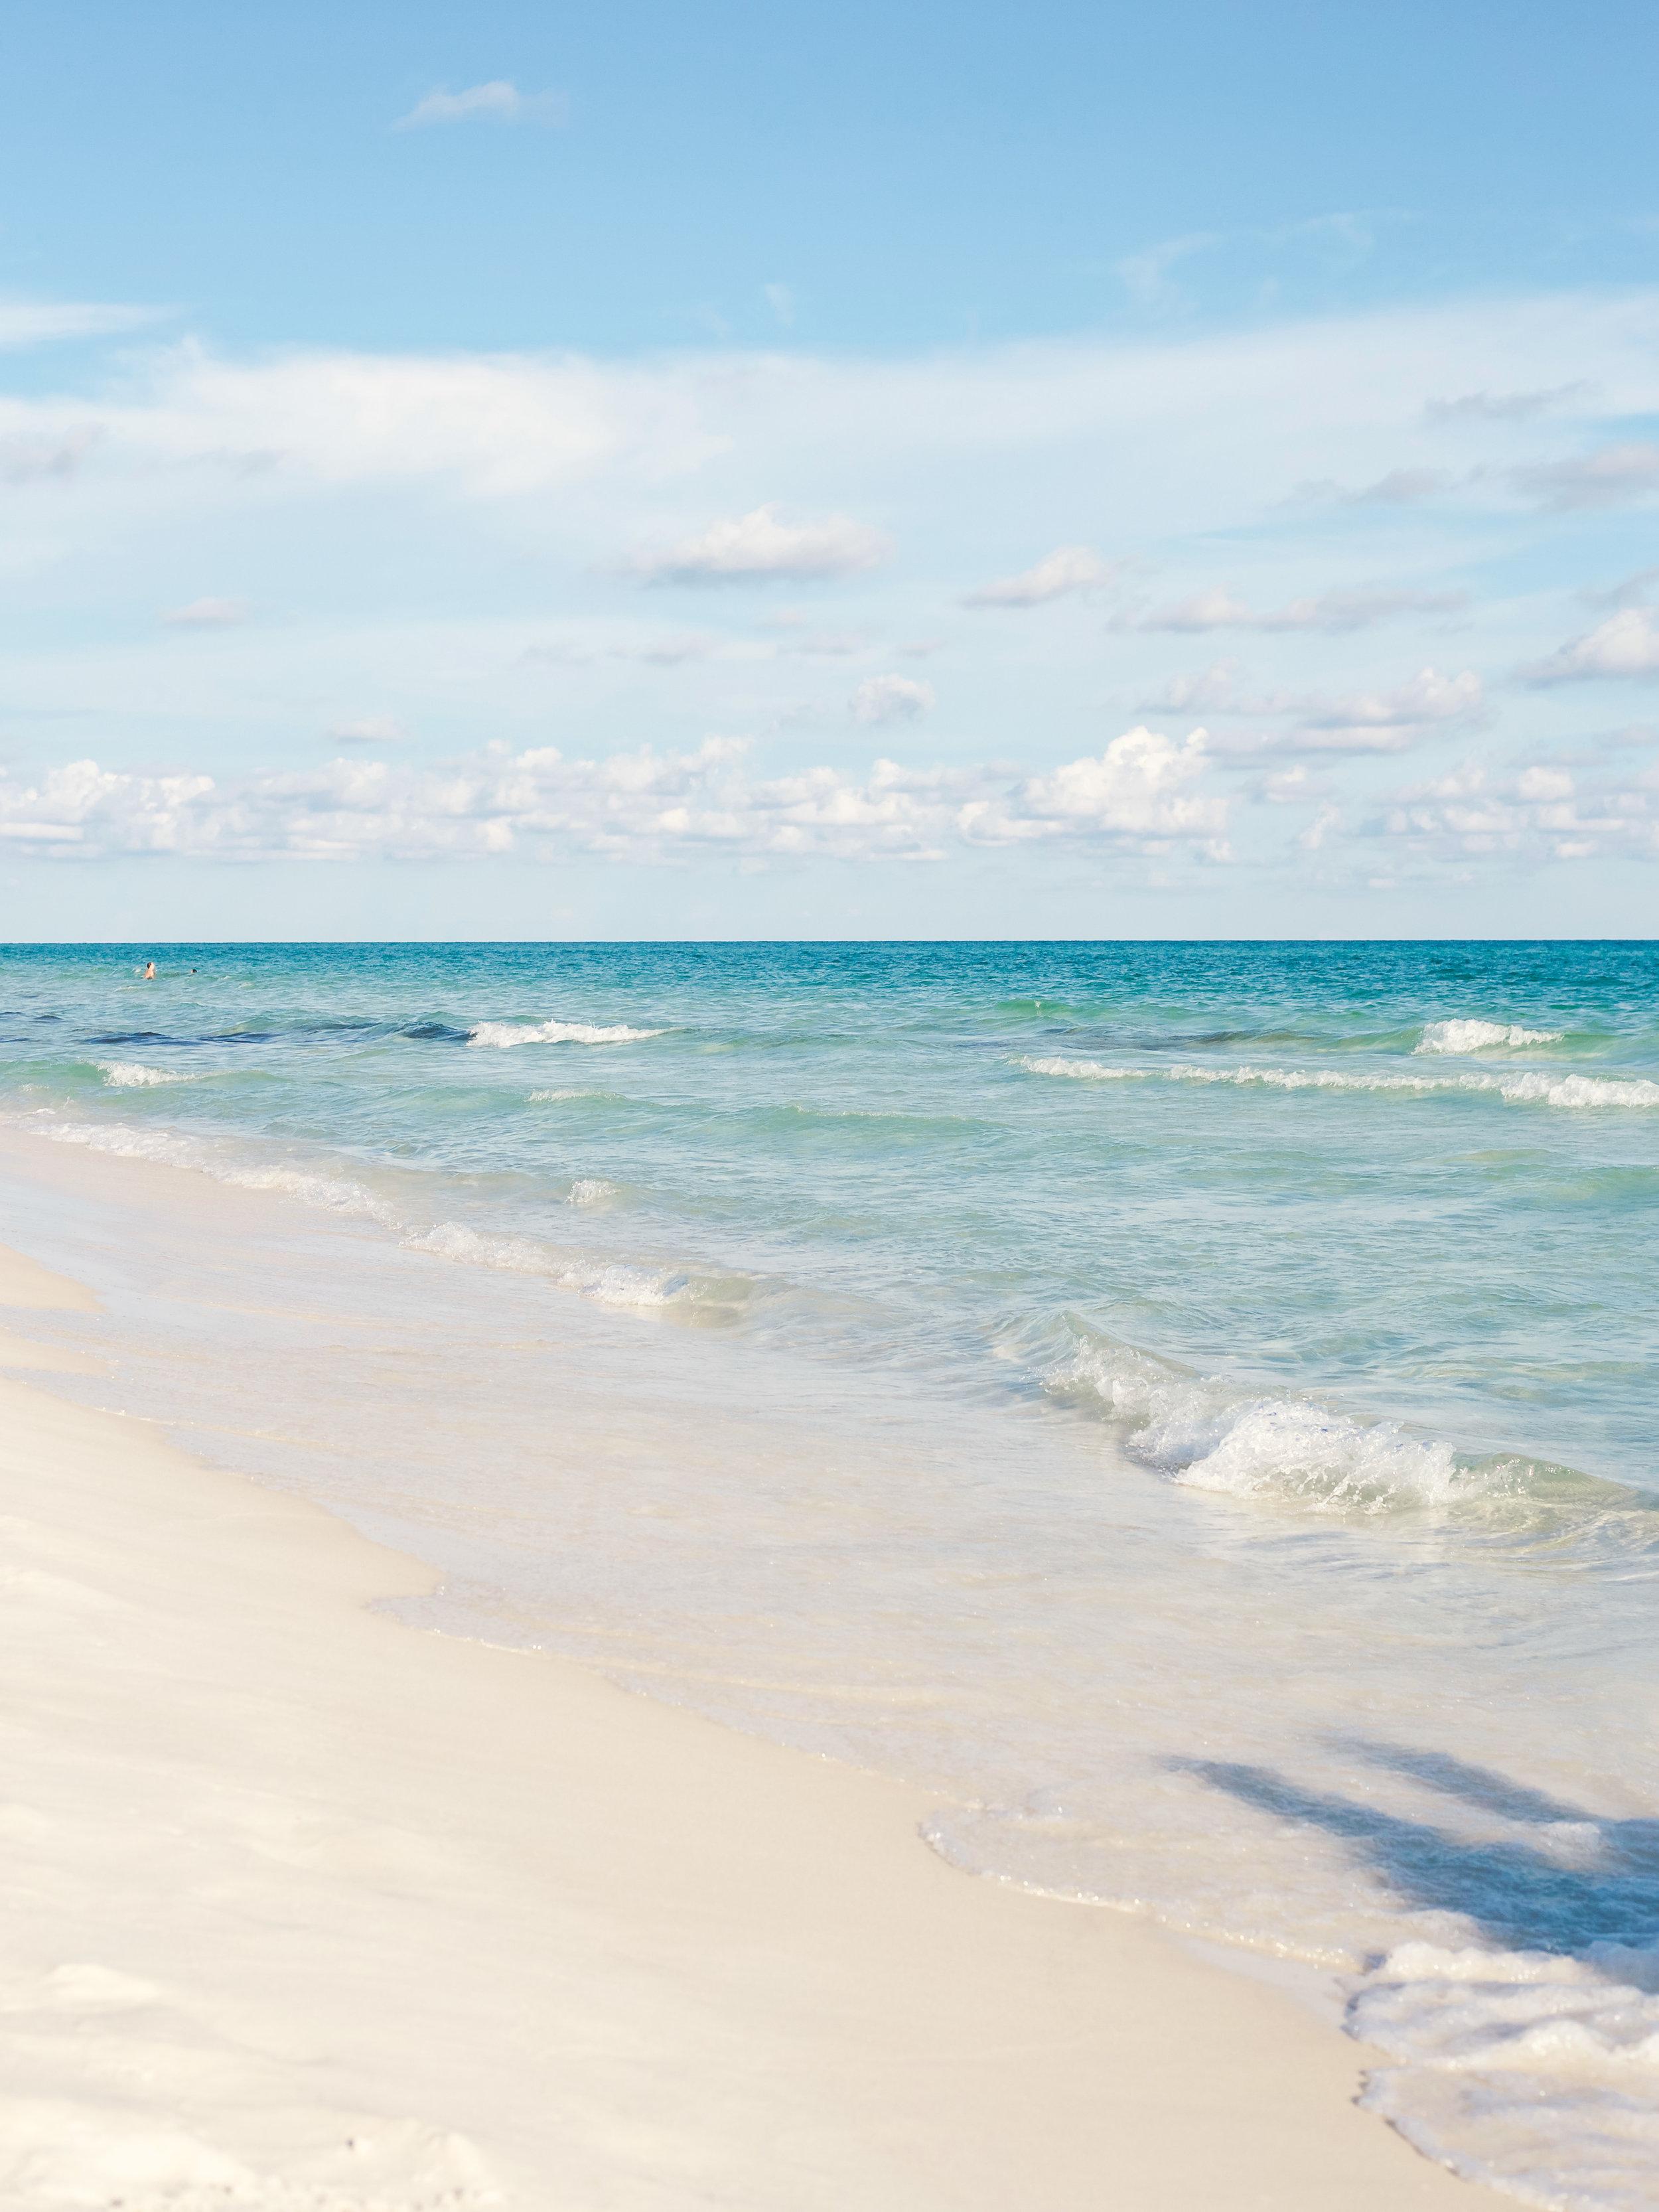 LCB STYLE FASHION BLOGGER SEASIDE FLORIDA 30A (23 of 25).jpg